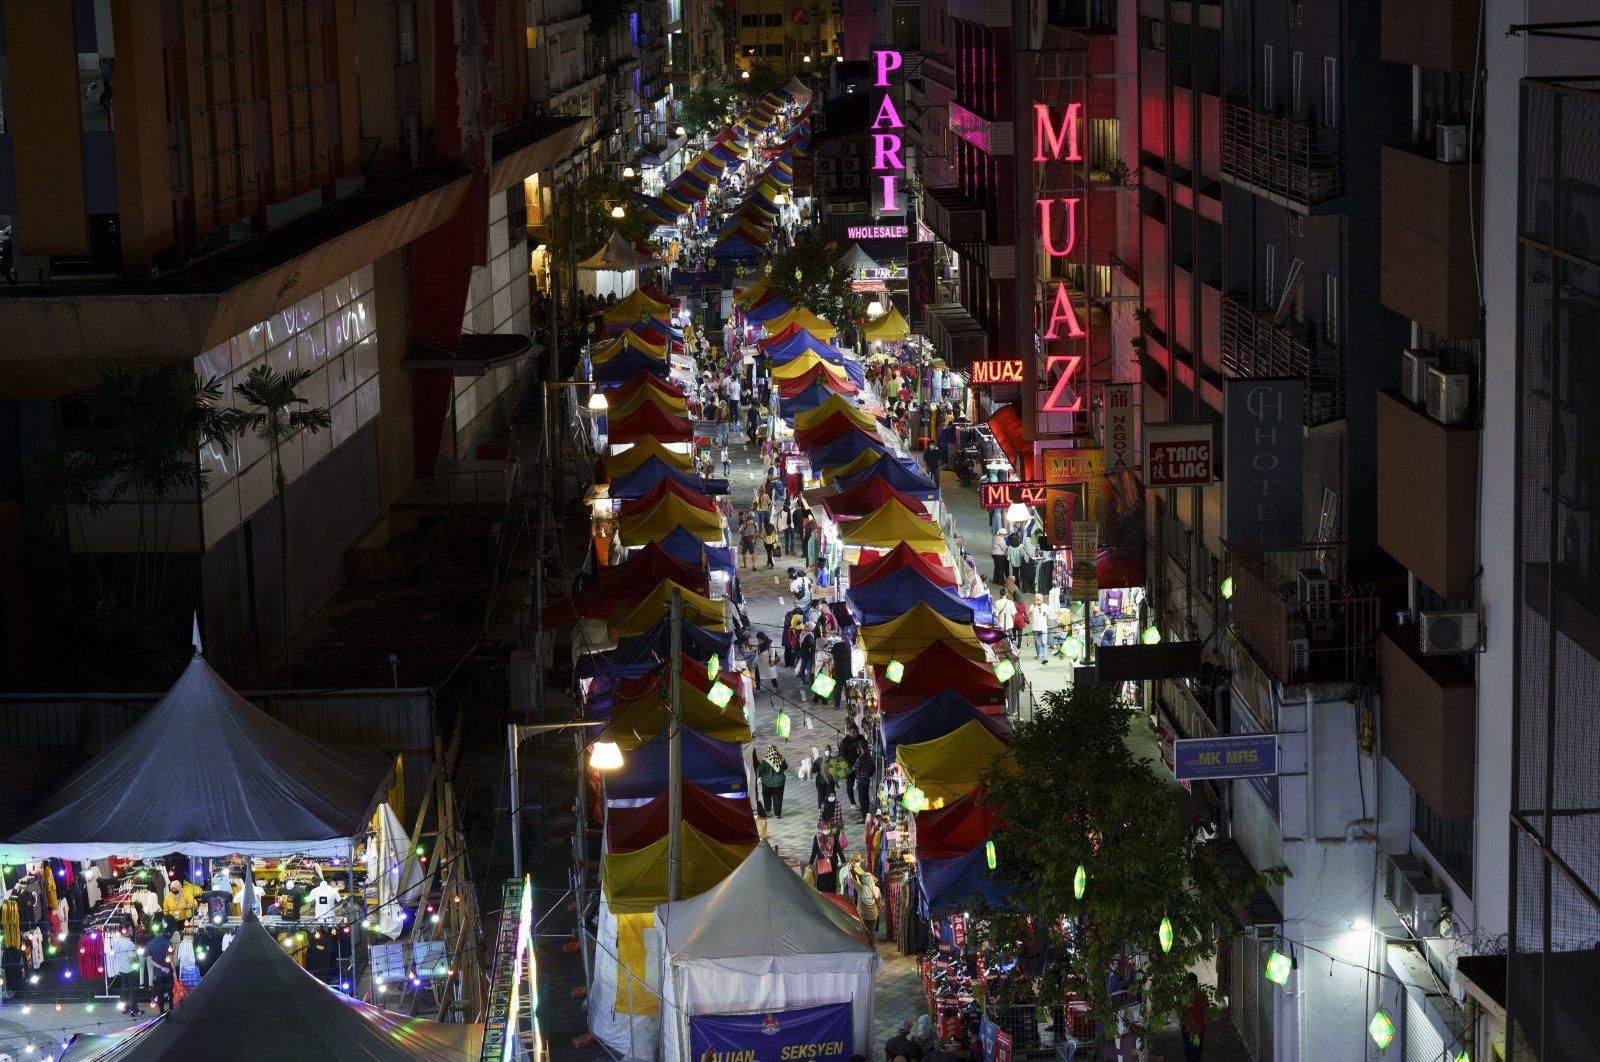 Shoppers walk through the outdoor Ramadan bazaar in Kuala Lumpur, Malaysia, April 24, 2021. (AP Photo)